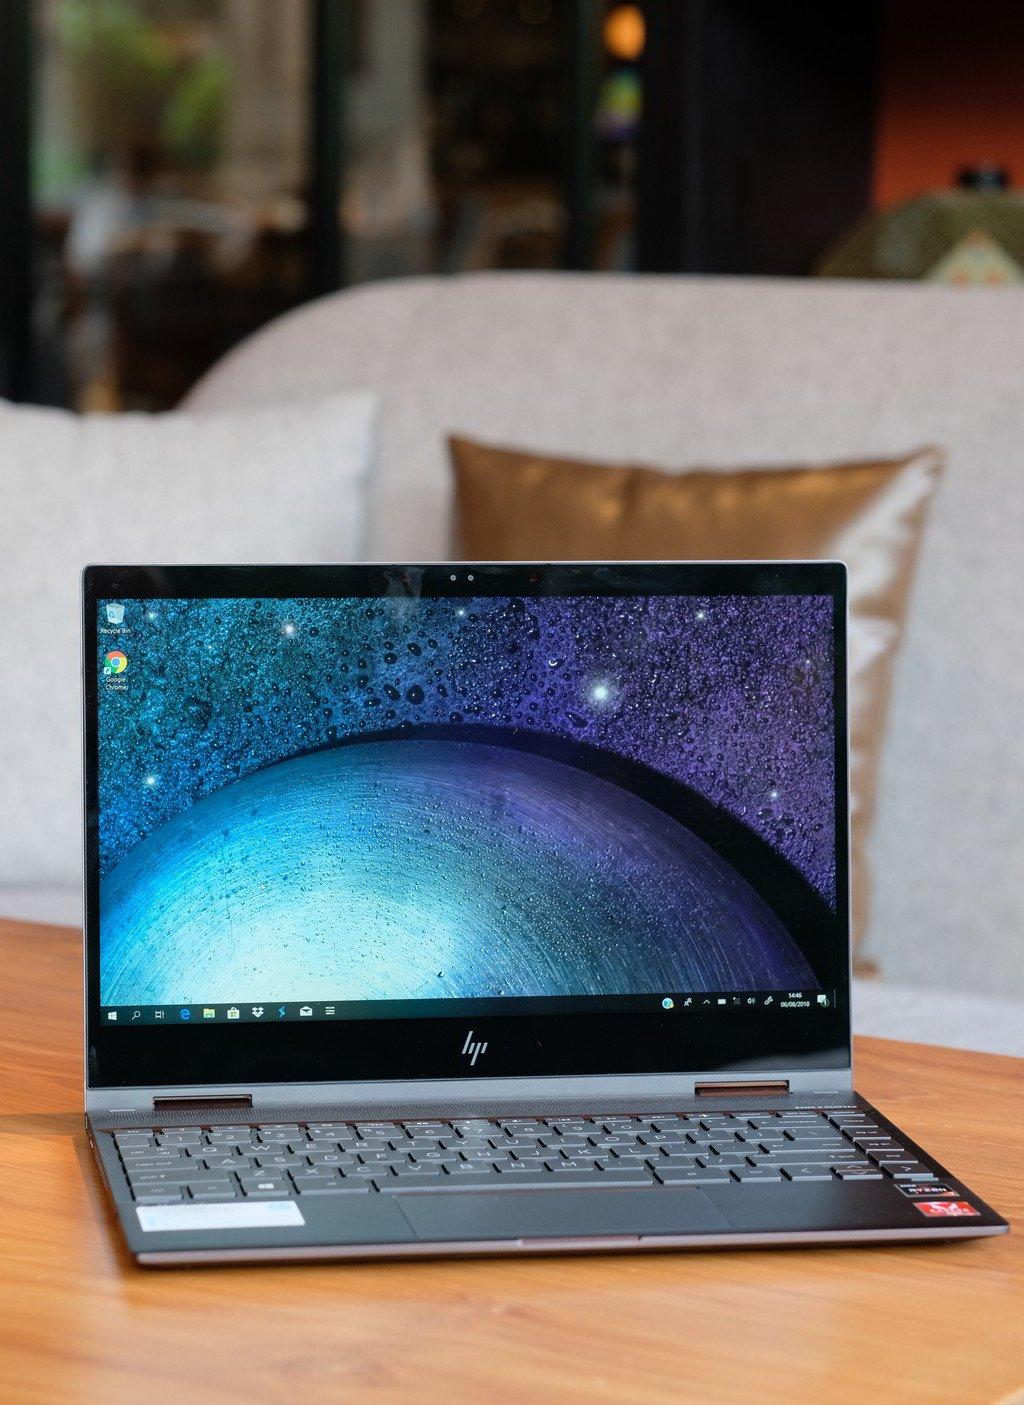 Hands On Mencermati Hp Envy X360 13 Laptop Ryzen Mobile Convertible 13 Inci Berdesain Premium 2 In 1 Notebook 19 August 2018